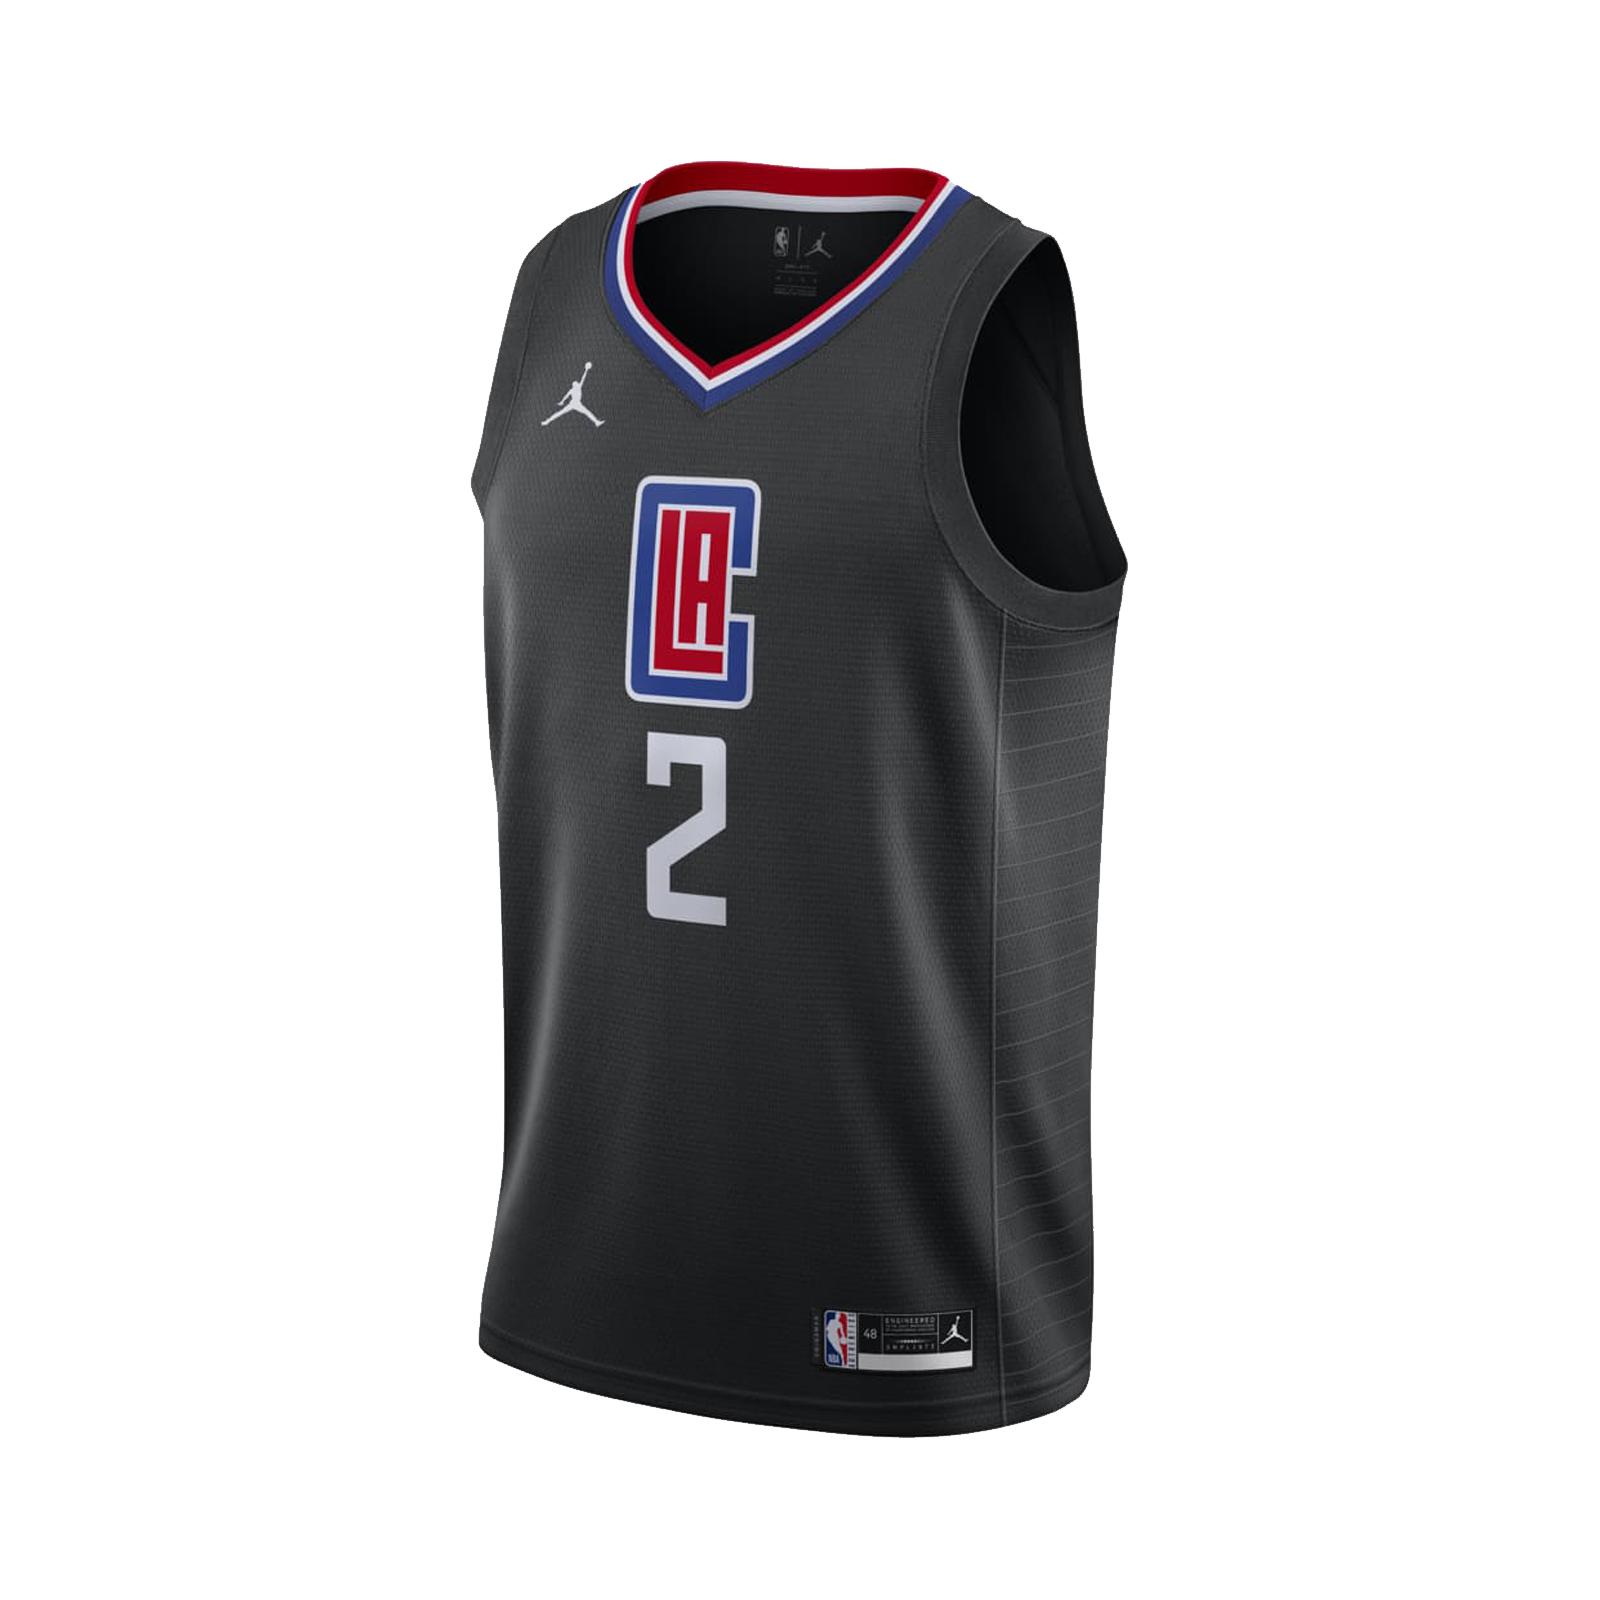 Nike NBA球衣 洛杉磯 快艇隊 可愛 Kawhi Leonard 2 黑 藍 喬丹【ACS】 CV9480-011